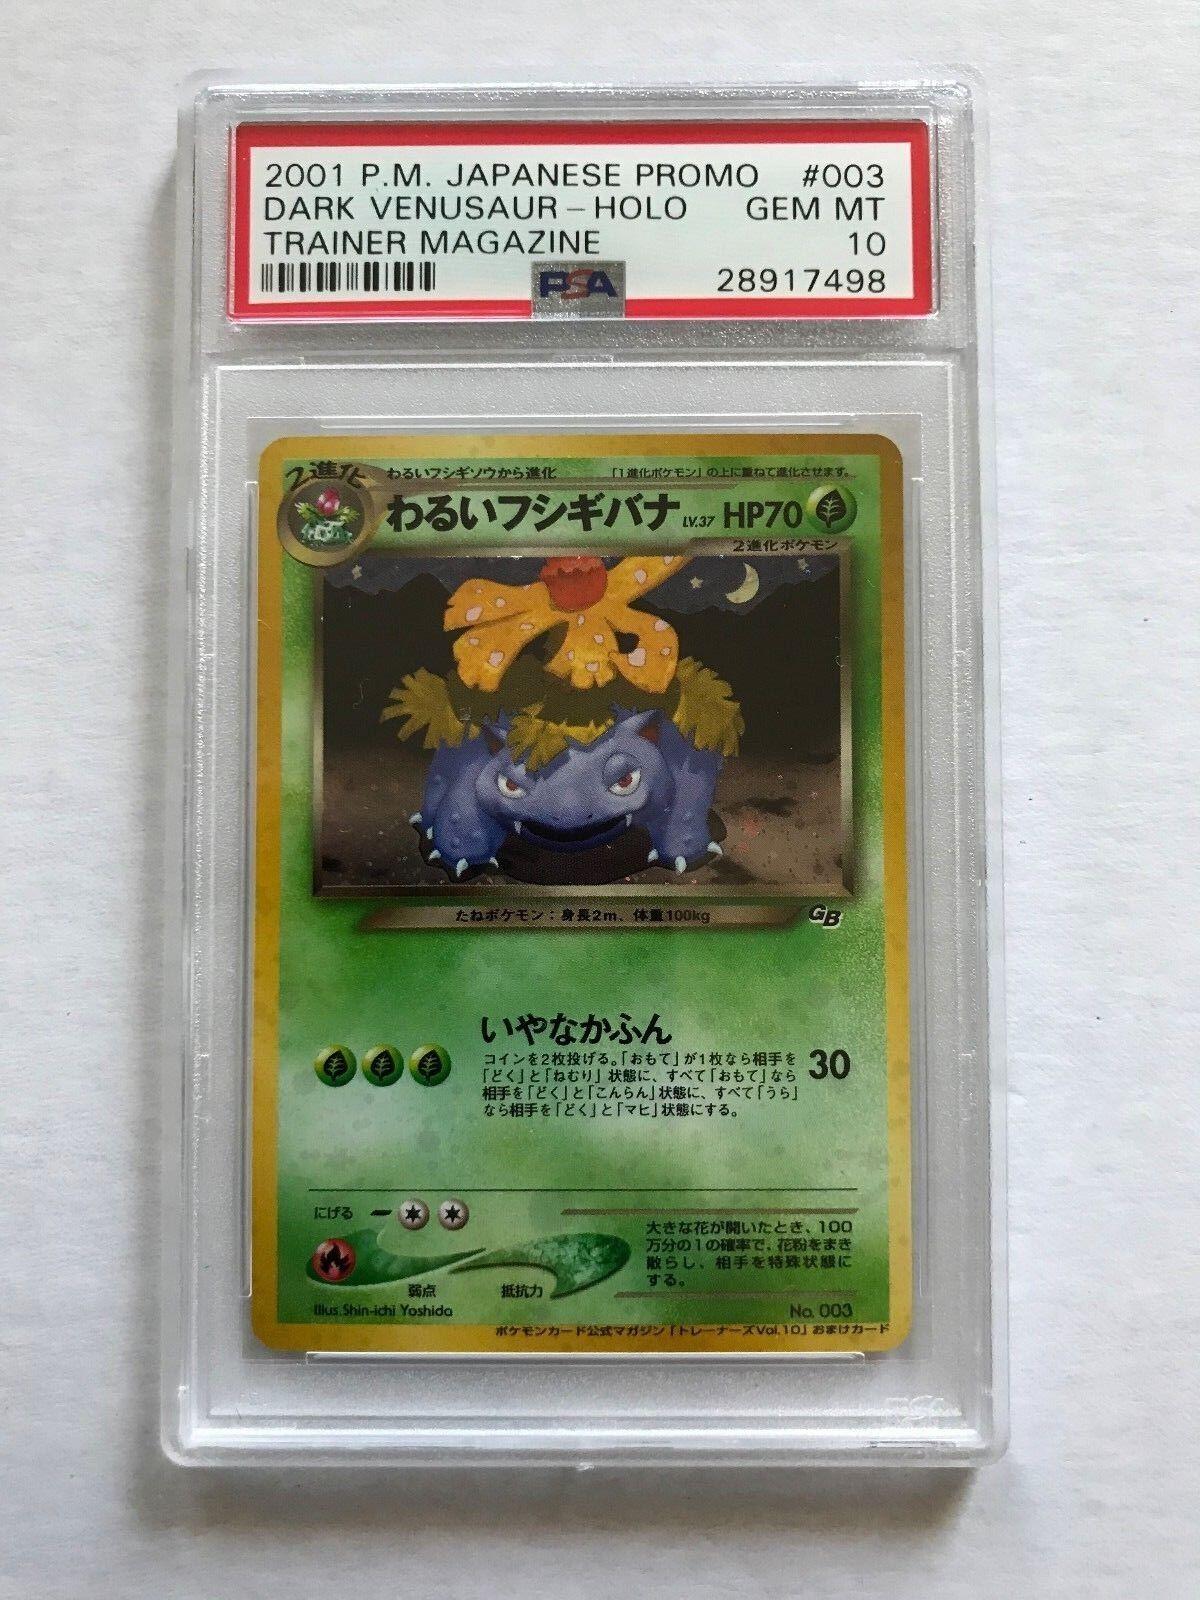 2001 Japanese Pokemon Card Dark Venusaur Game Boy Promo Trainer Magazine PSA 10